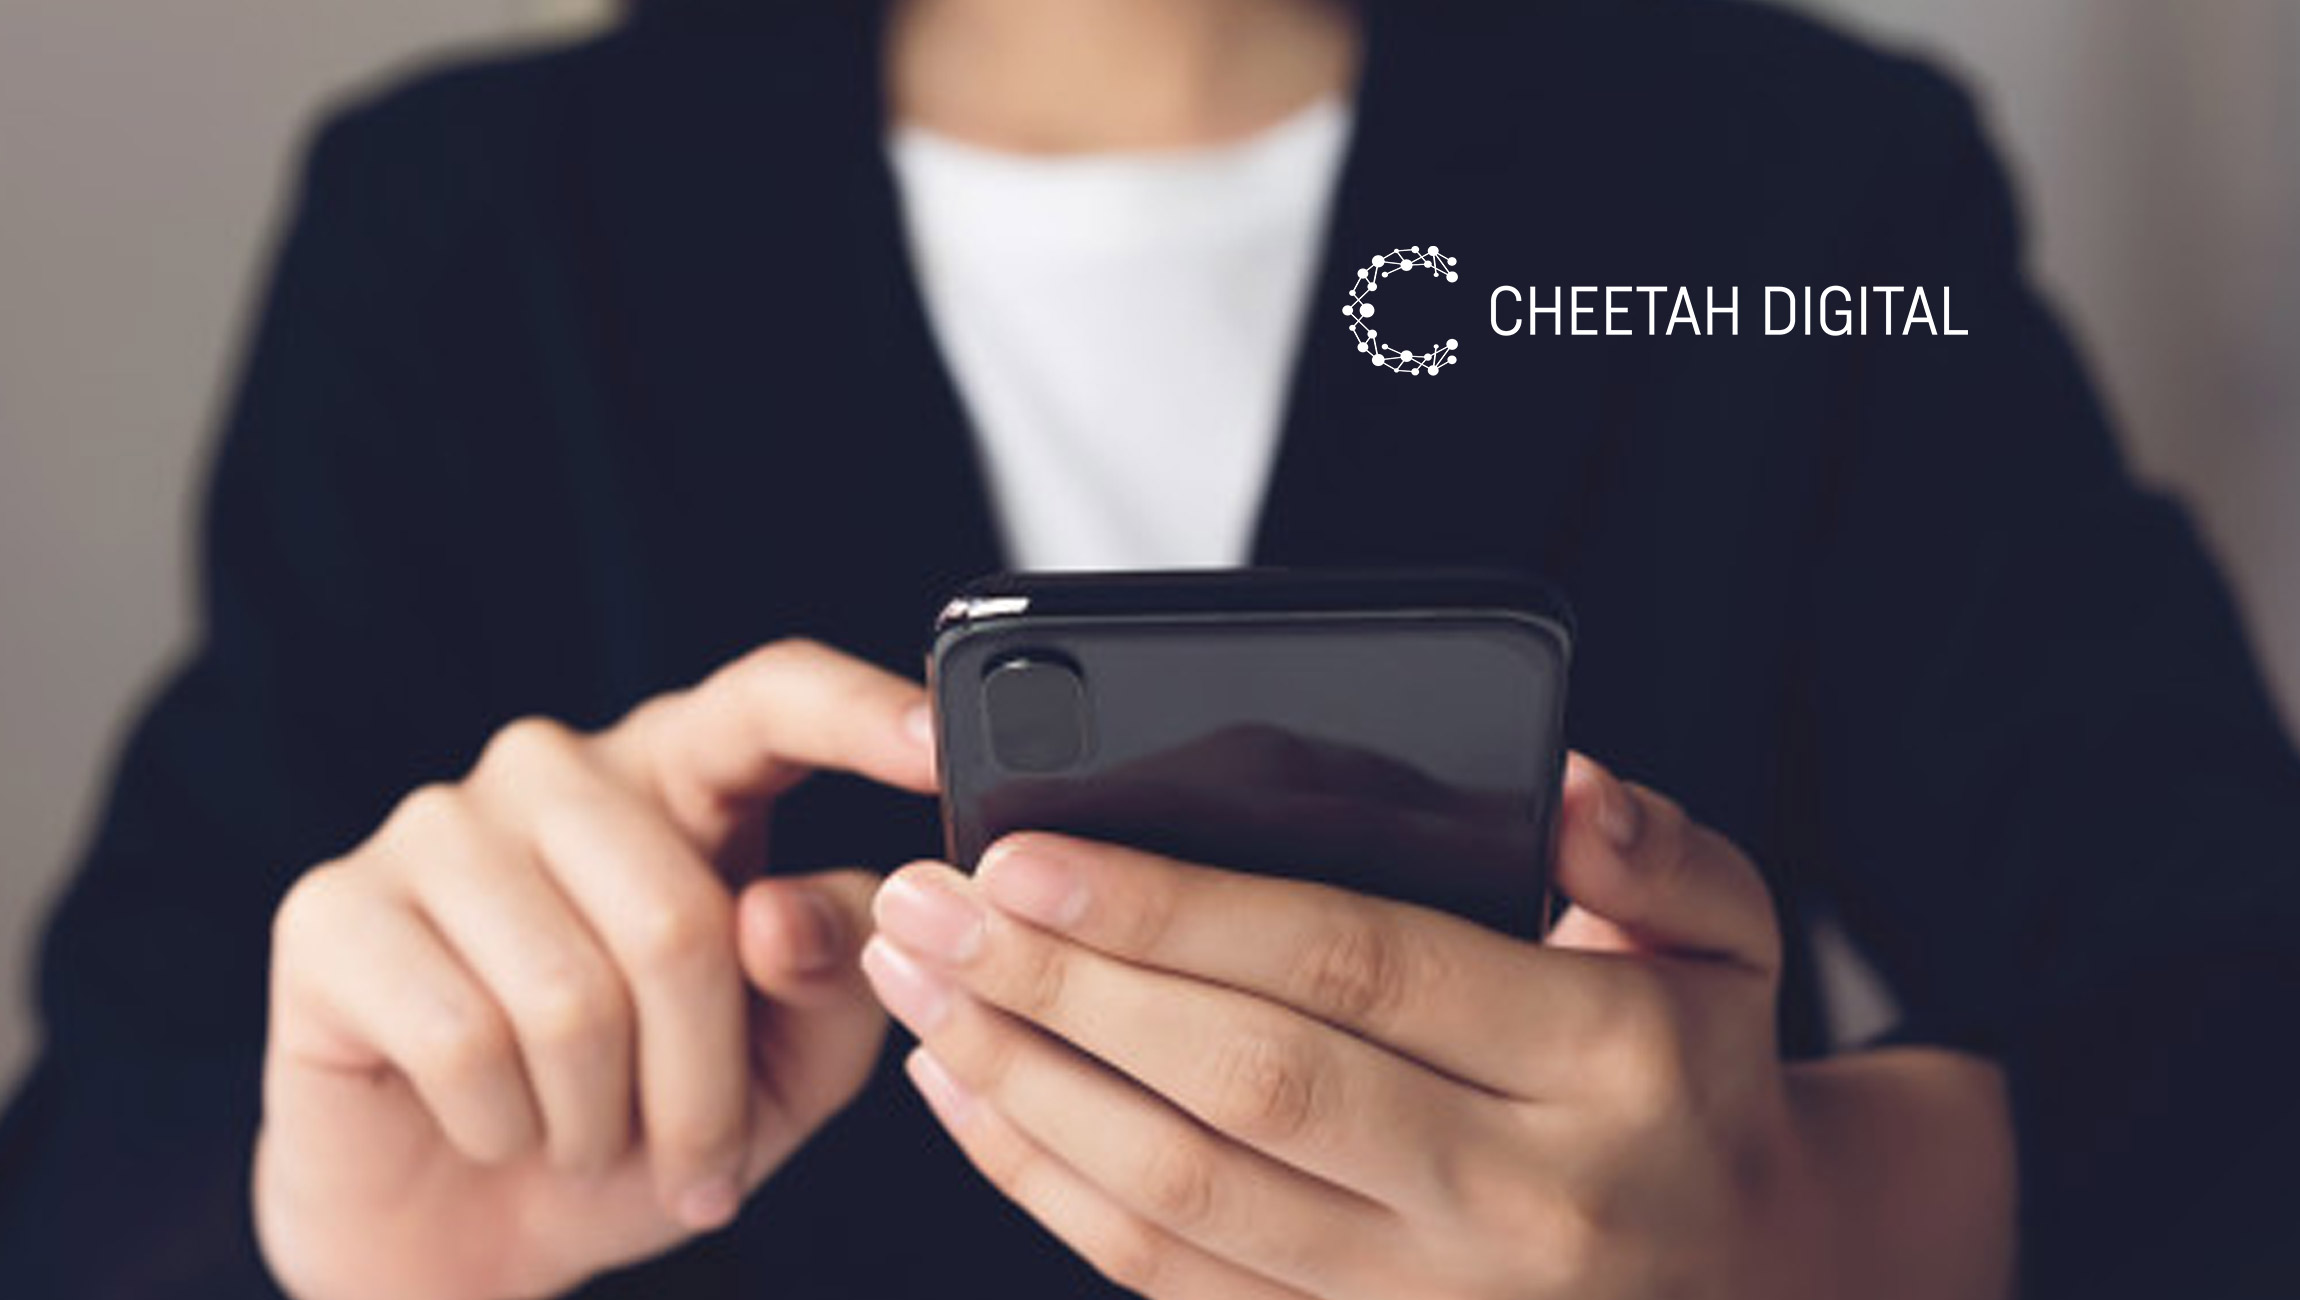 Patrick Tripp to Lead Product Marketing for Cheetah Digital